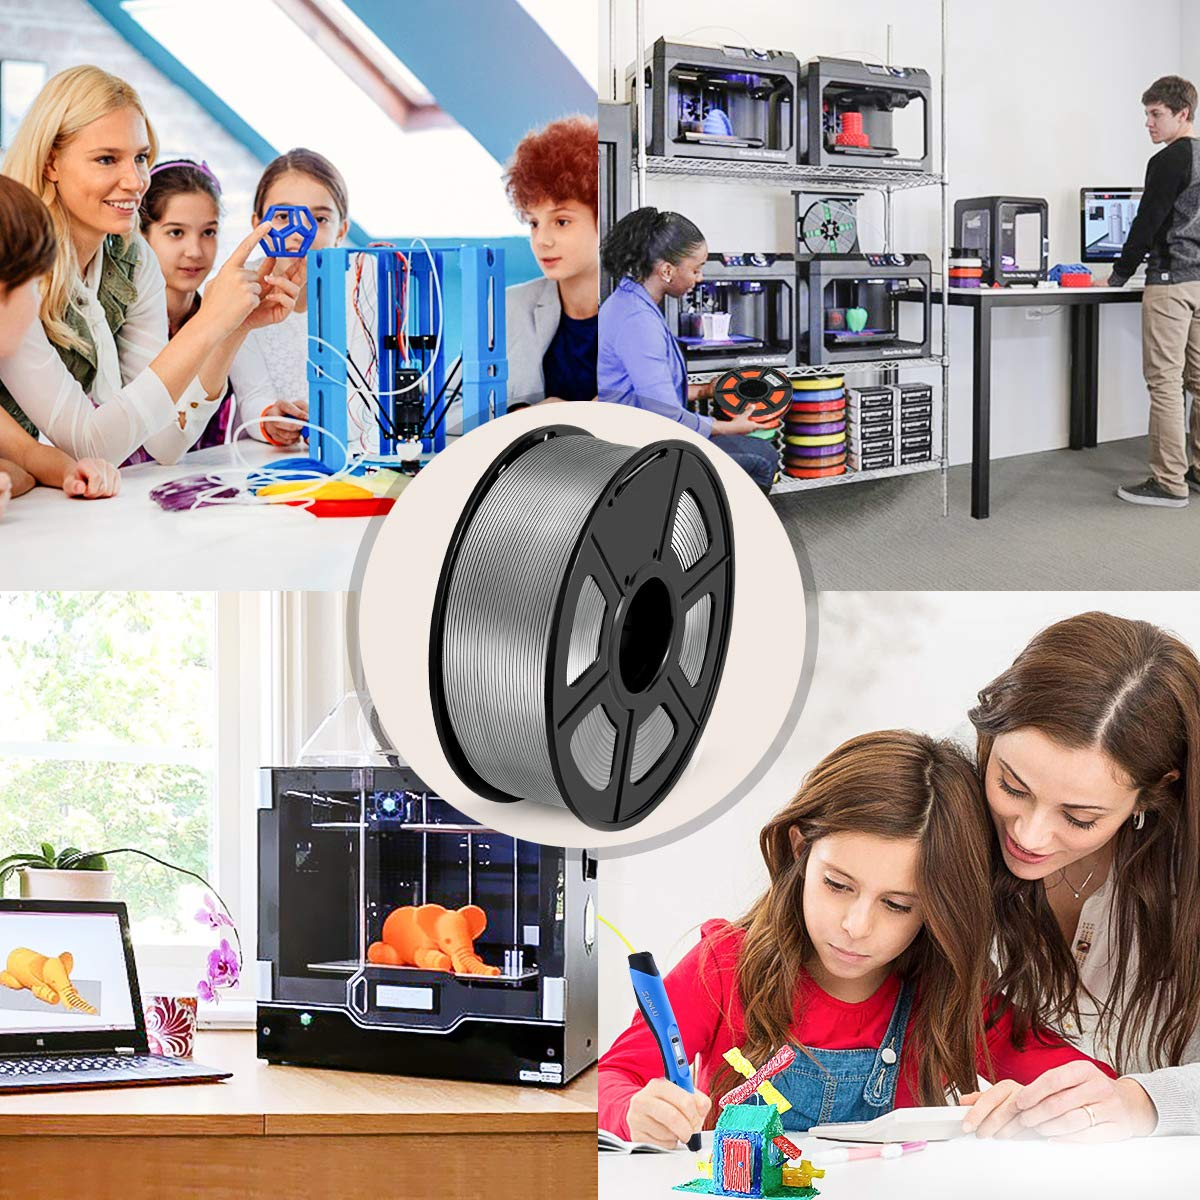 PETG Negro Precisi/ón Dimensional 0.02 mm // SUNLU Filamento PETG 1.75mm 1kg Impresora 3D Filamento